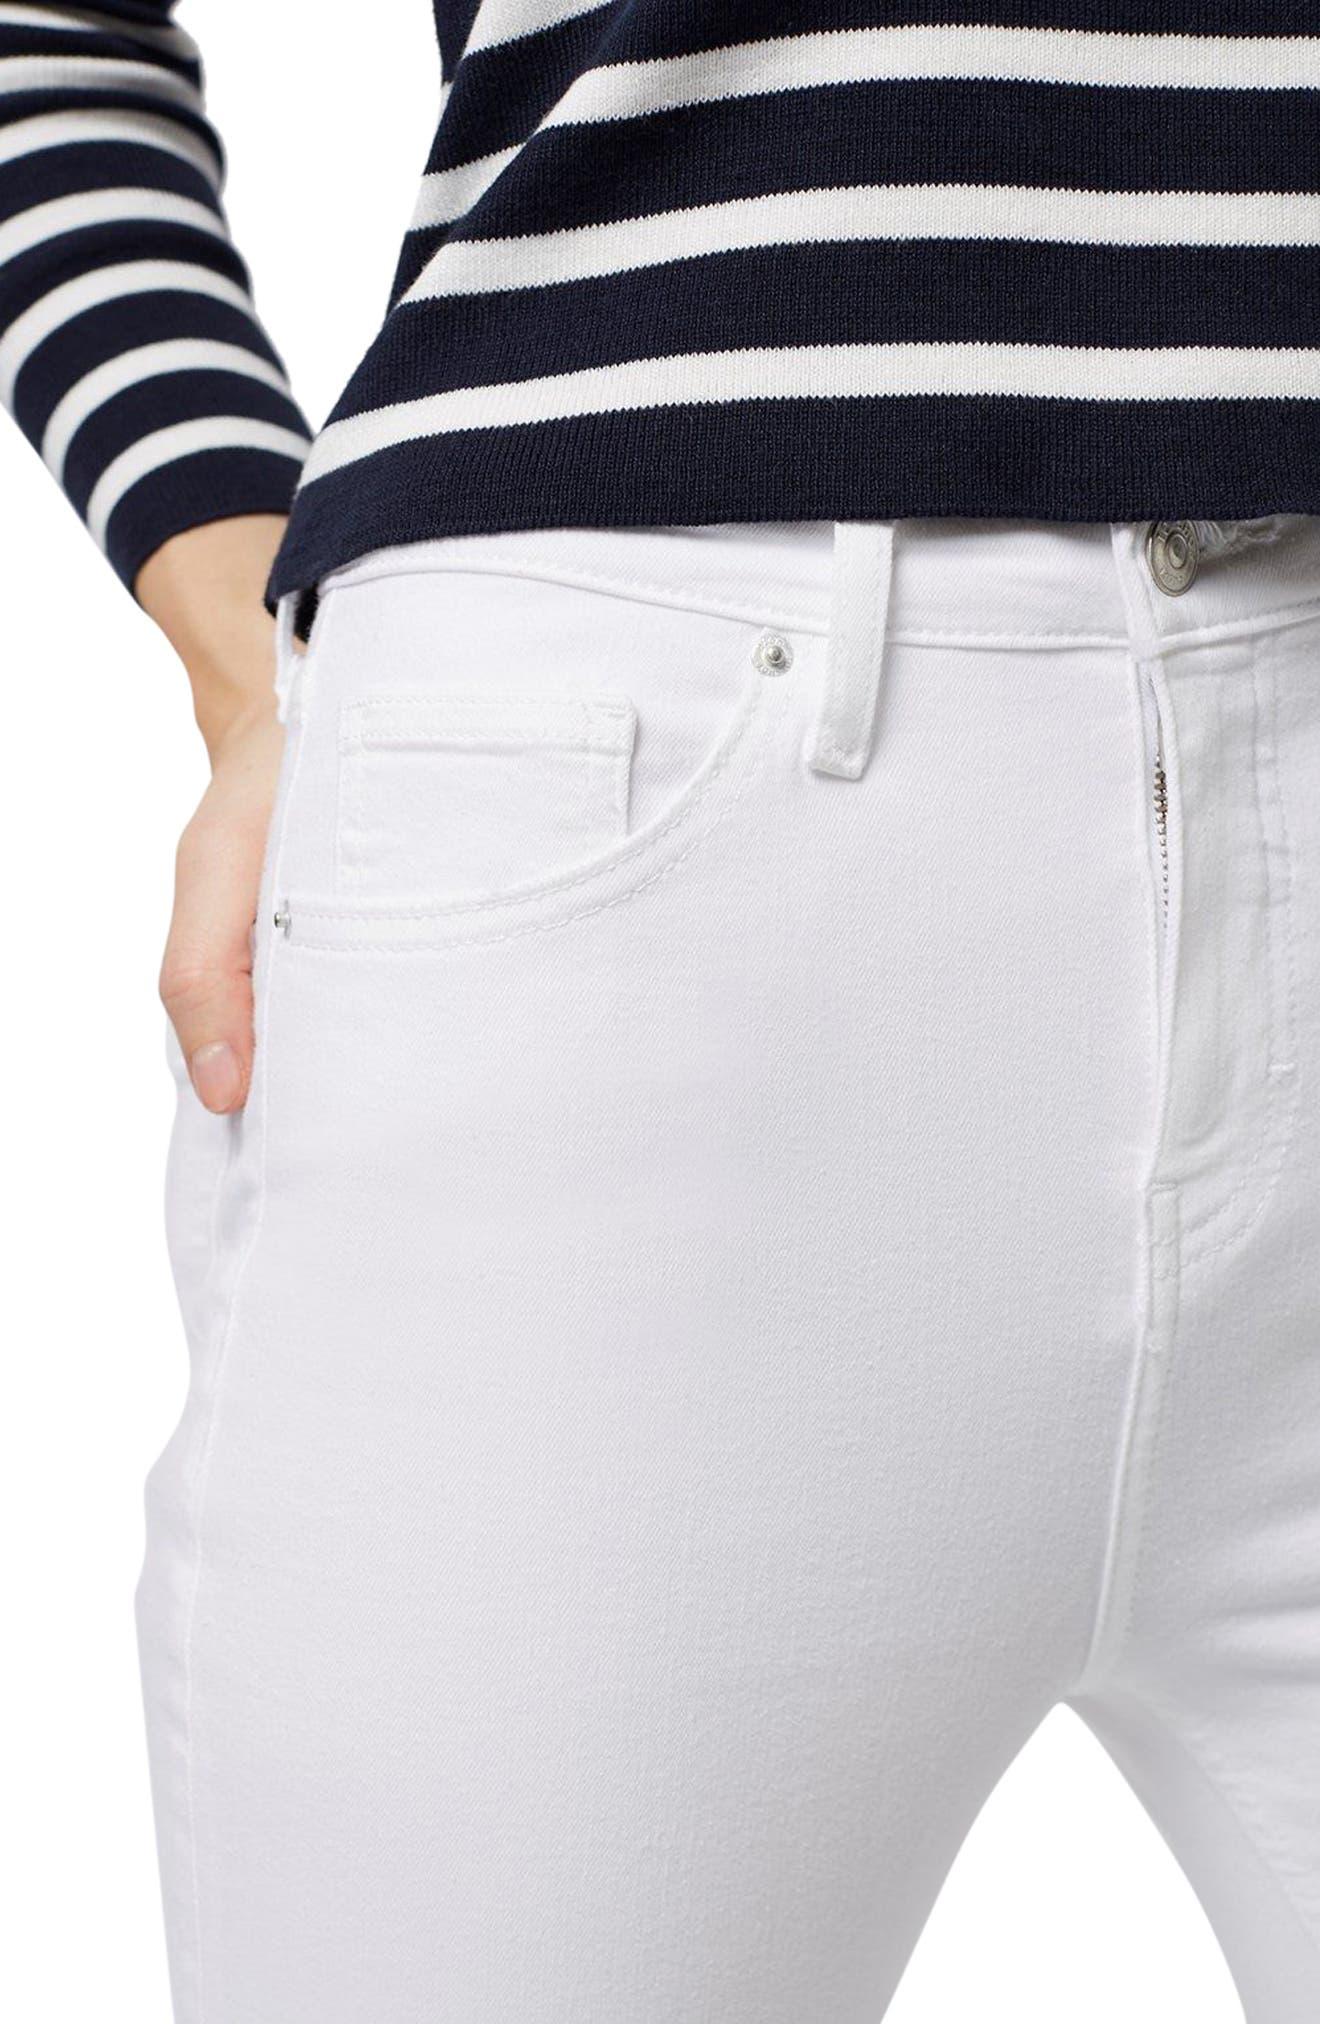 Moto Jamie Jeans,                             Alternate thumbnail 4, color,                             White